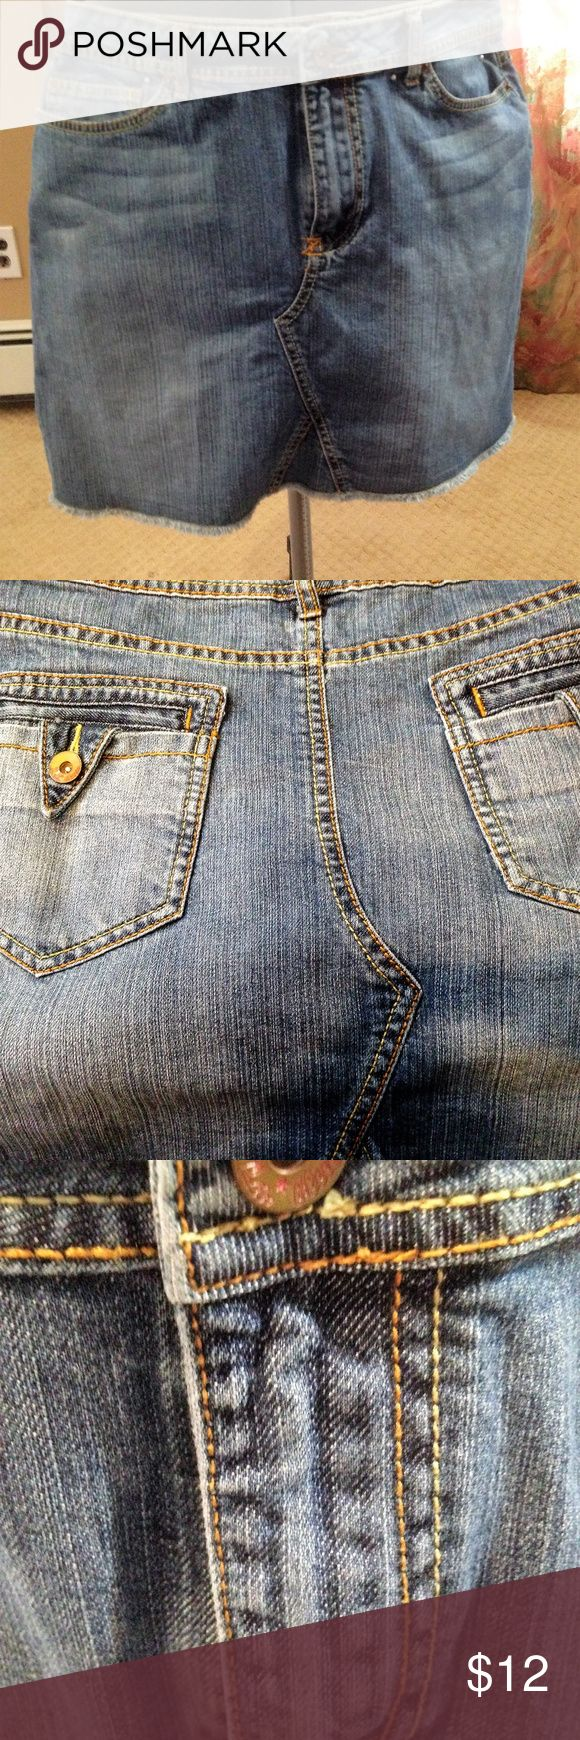 "l.a. blues Lightweight Stretch Denim Skirt Lightweight stretch denim jeans skirt made from jeans. Two detailed back pockets, raw hemline. Measurements- Waist 33"", Length 16"". l.a. blues Skirts Mini"